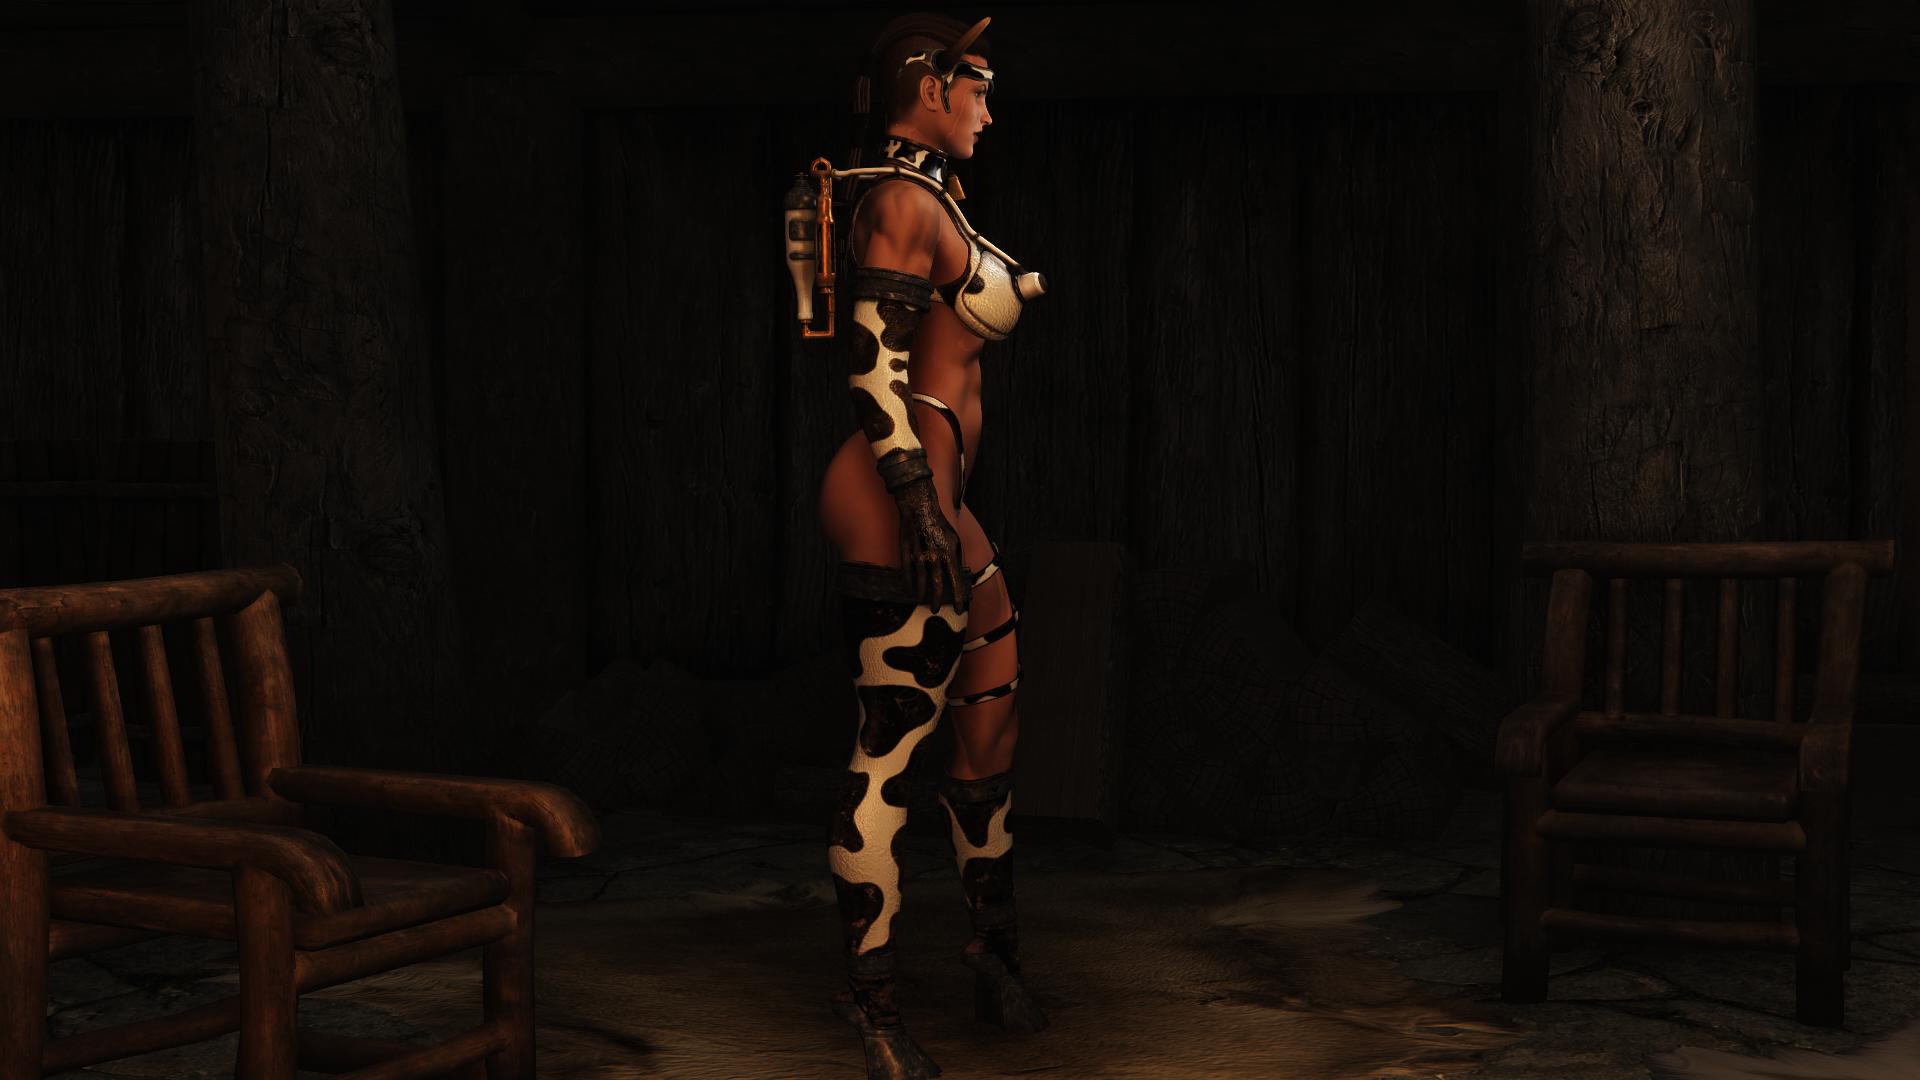 The-Elder-Scrolls-V-Skyrim-Special-Editi